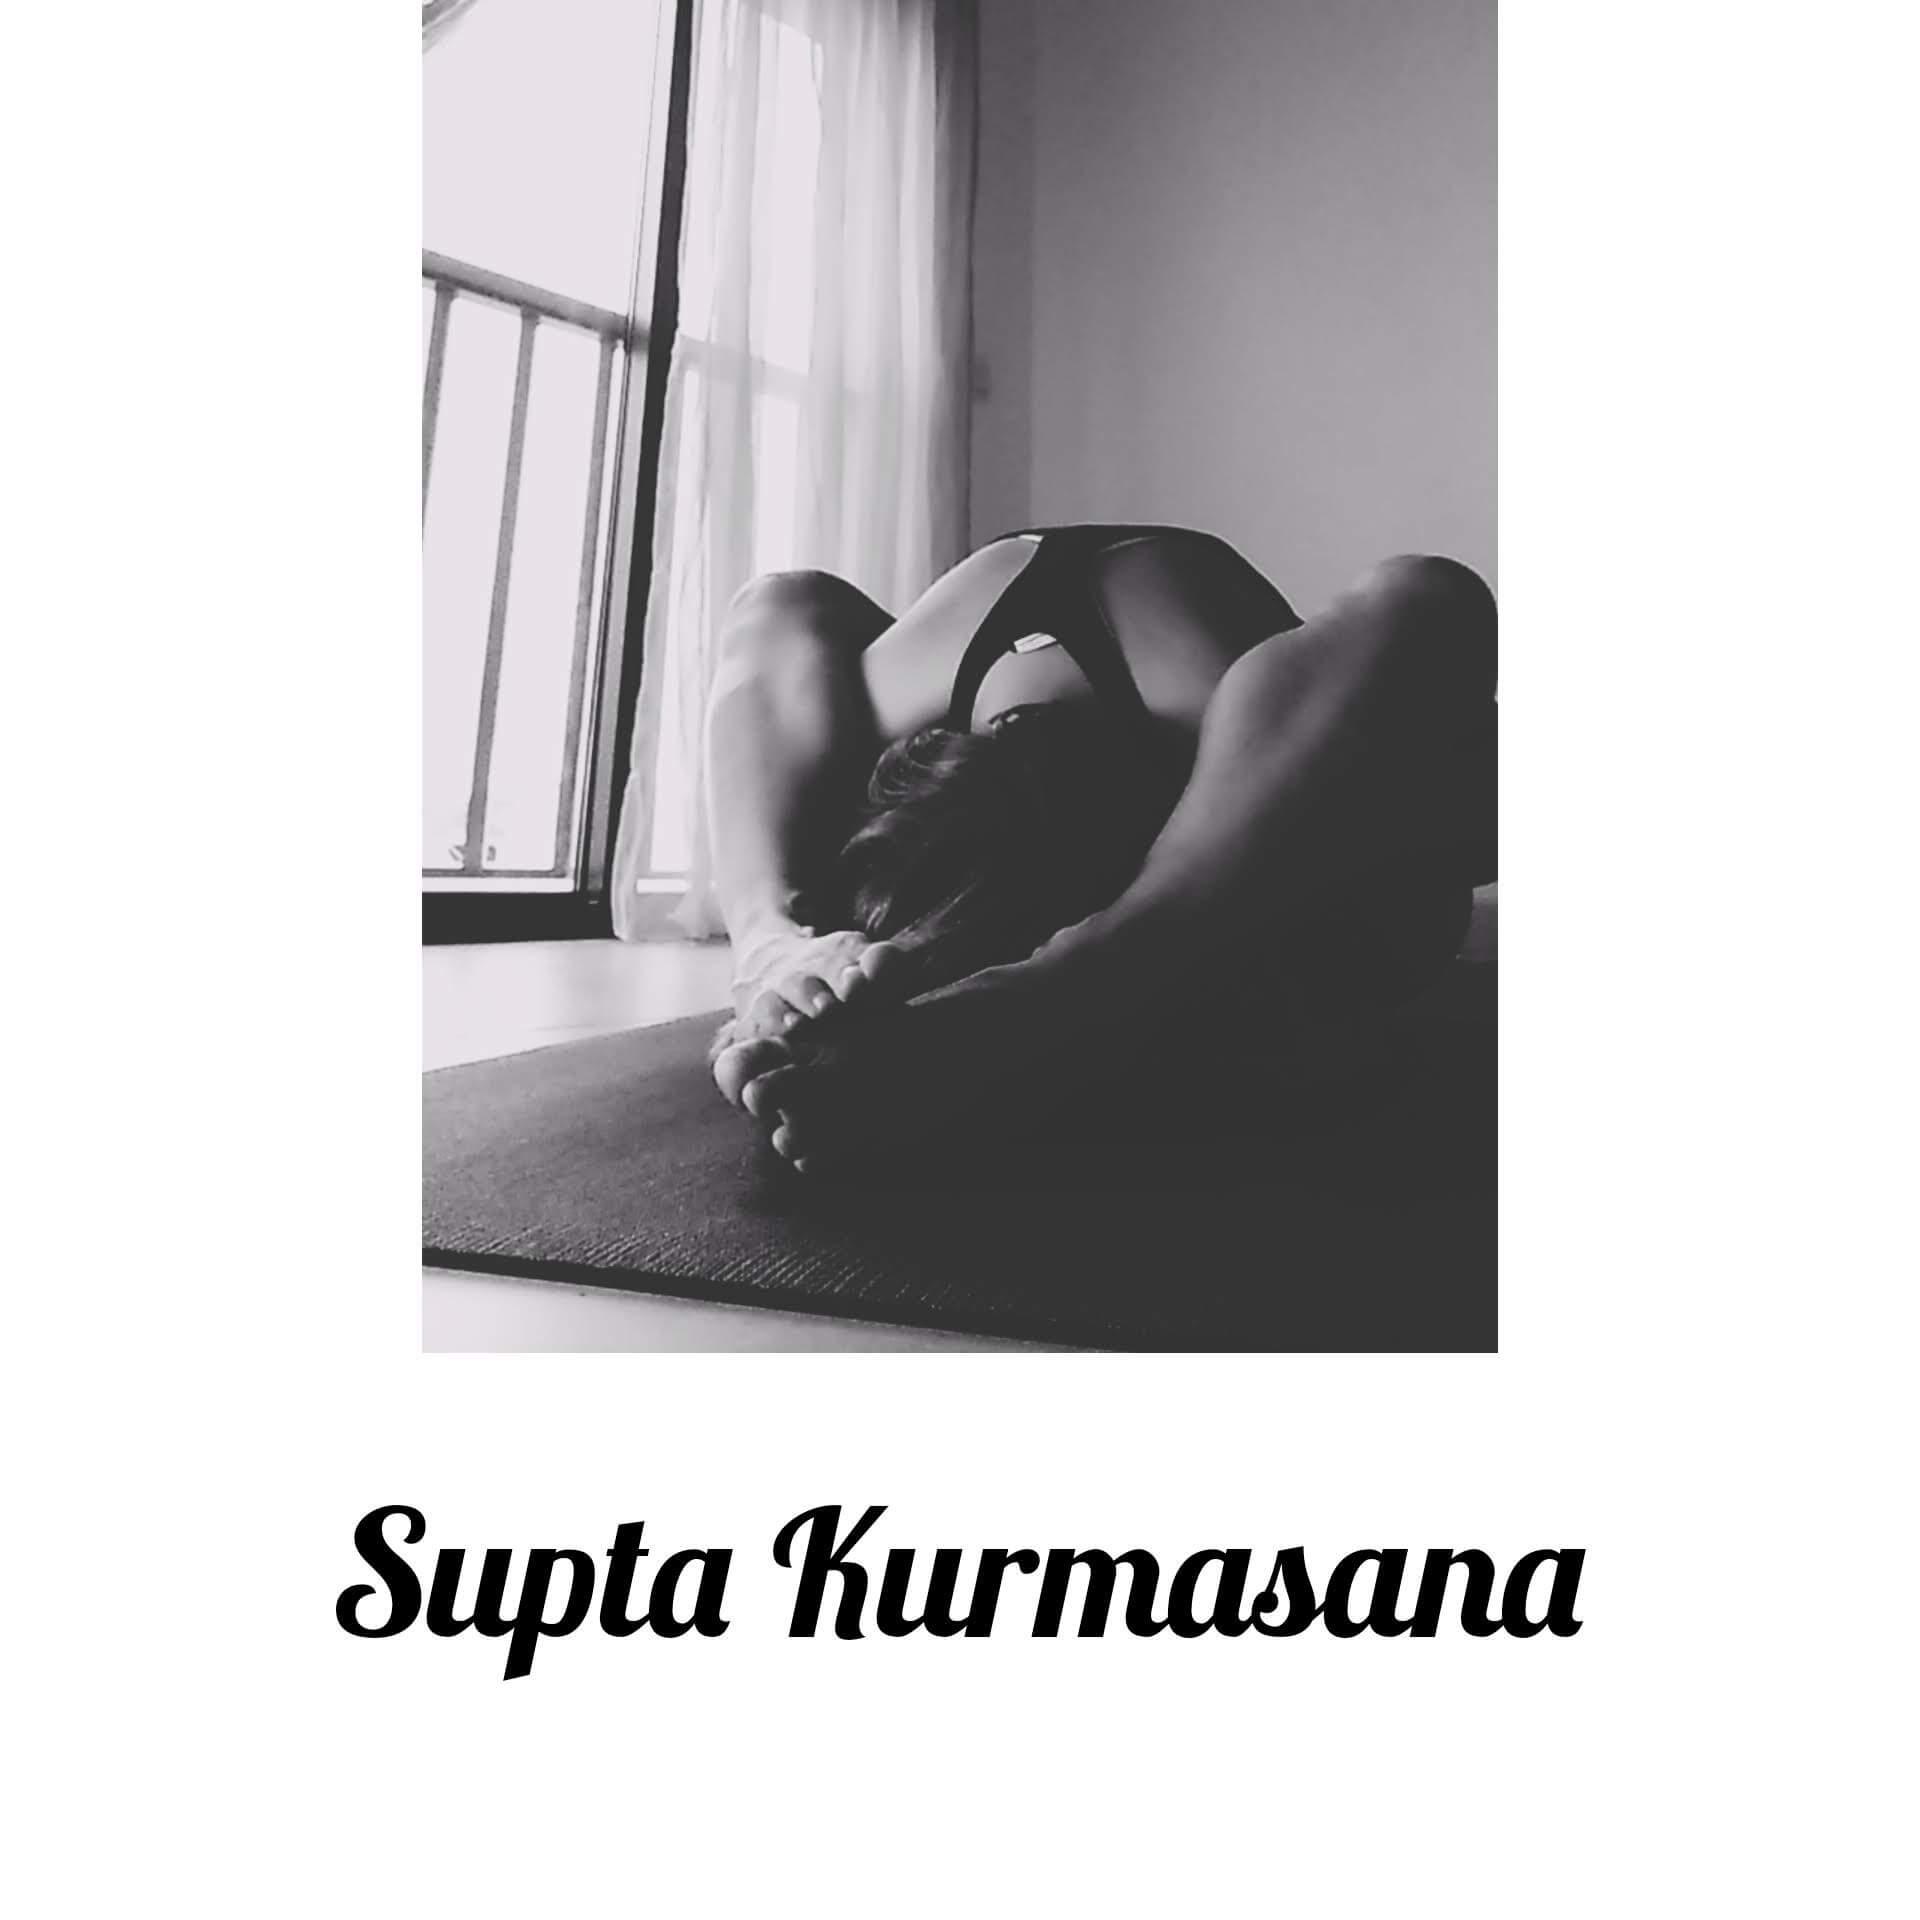 Supta Kurmasana